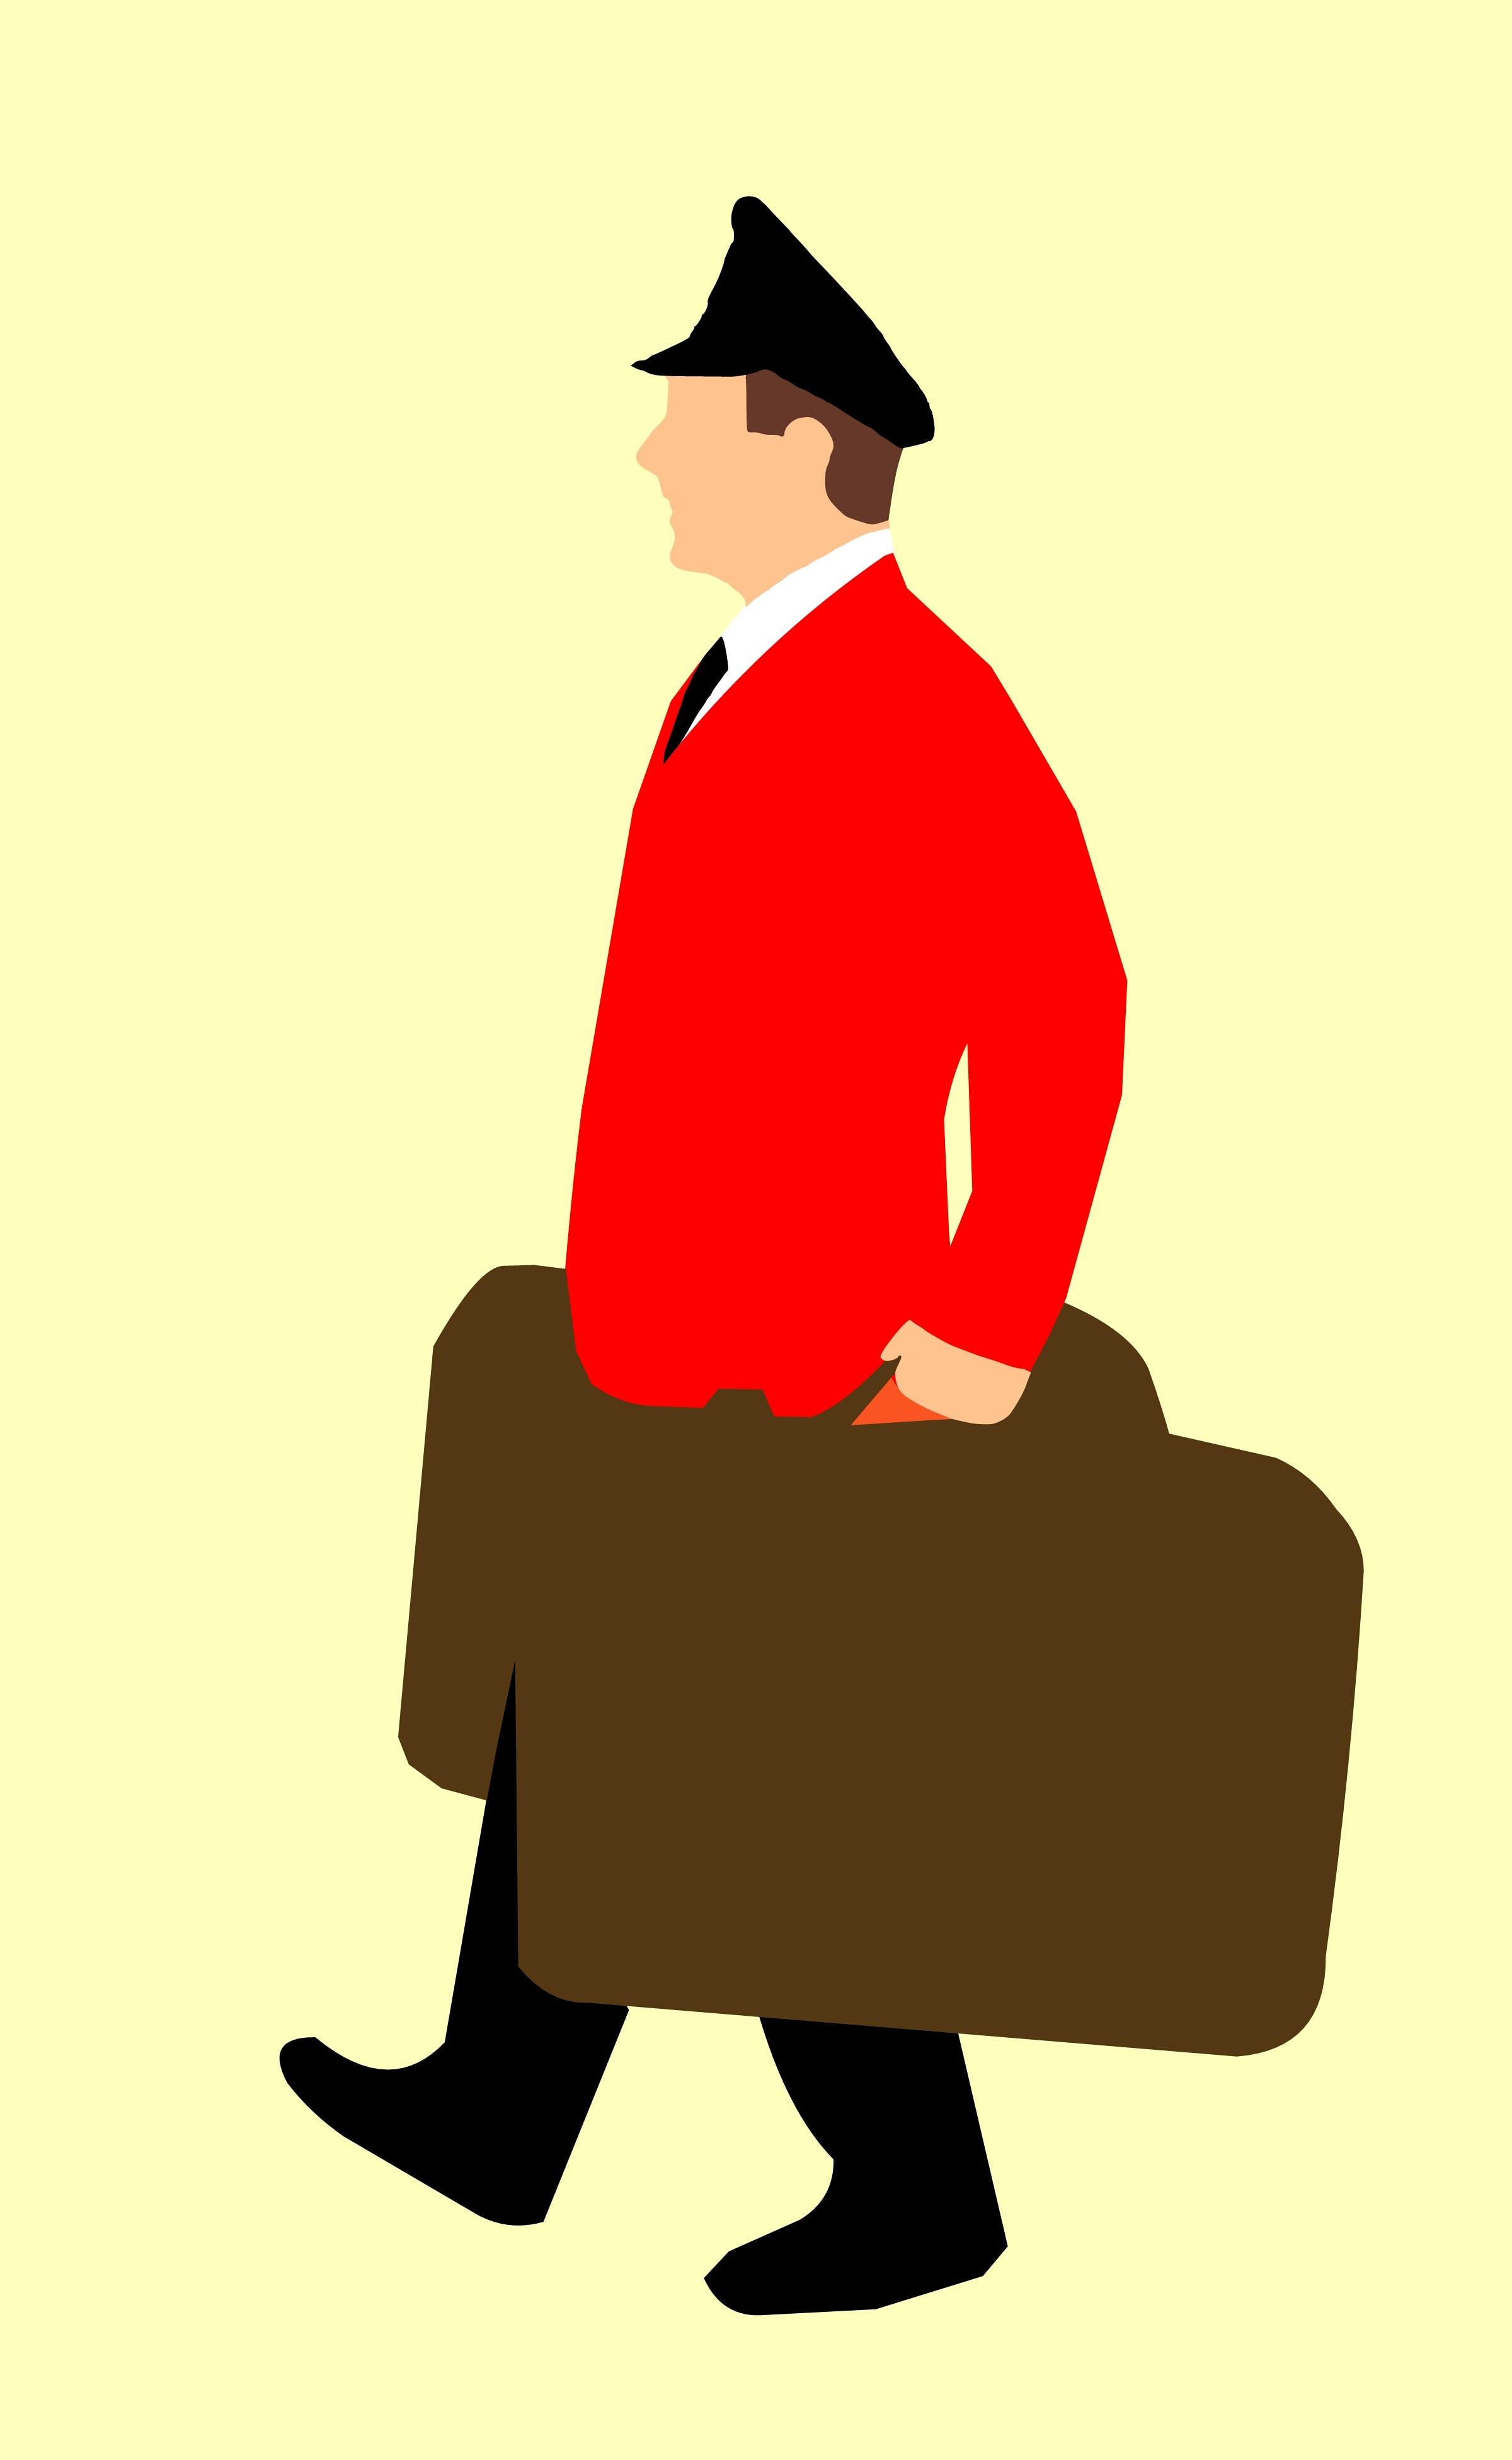 Free stock photo of man, people, hotel, jacket